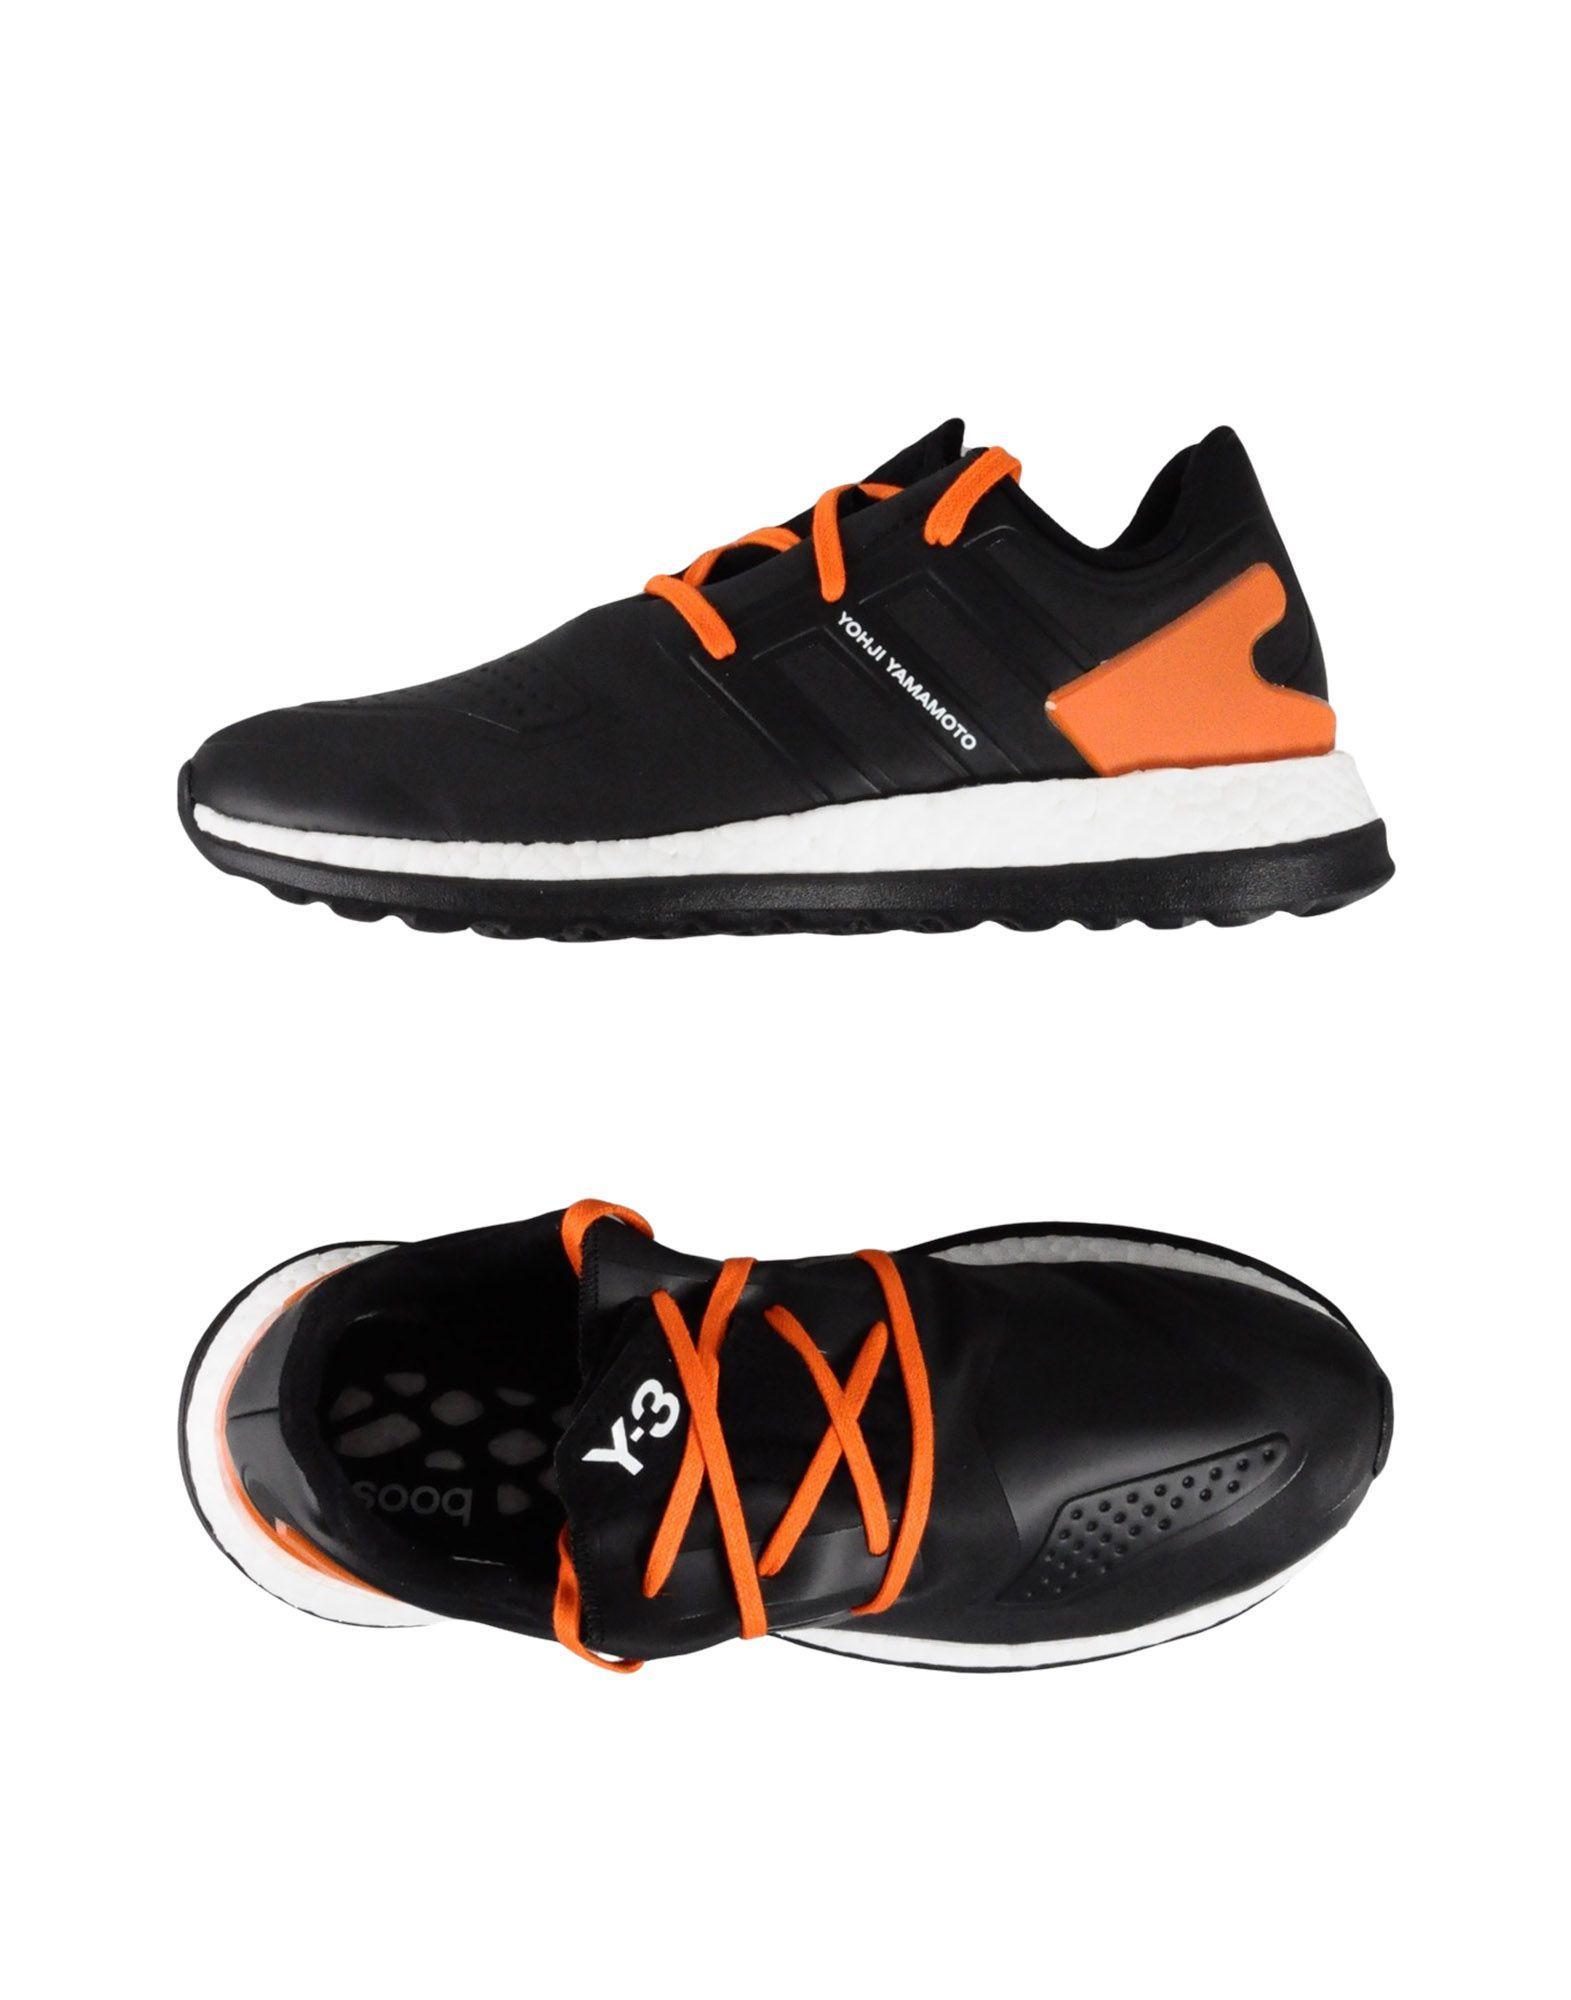 586c7ec375b00 Y-3 Pure Boost Leather Sneaker